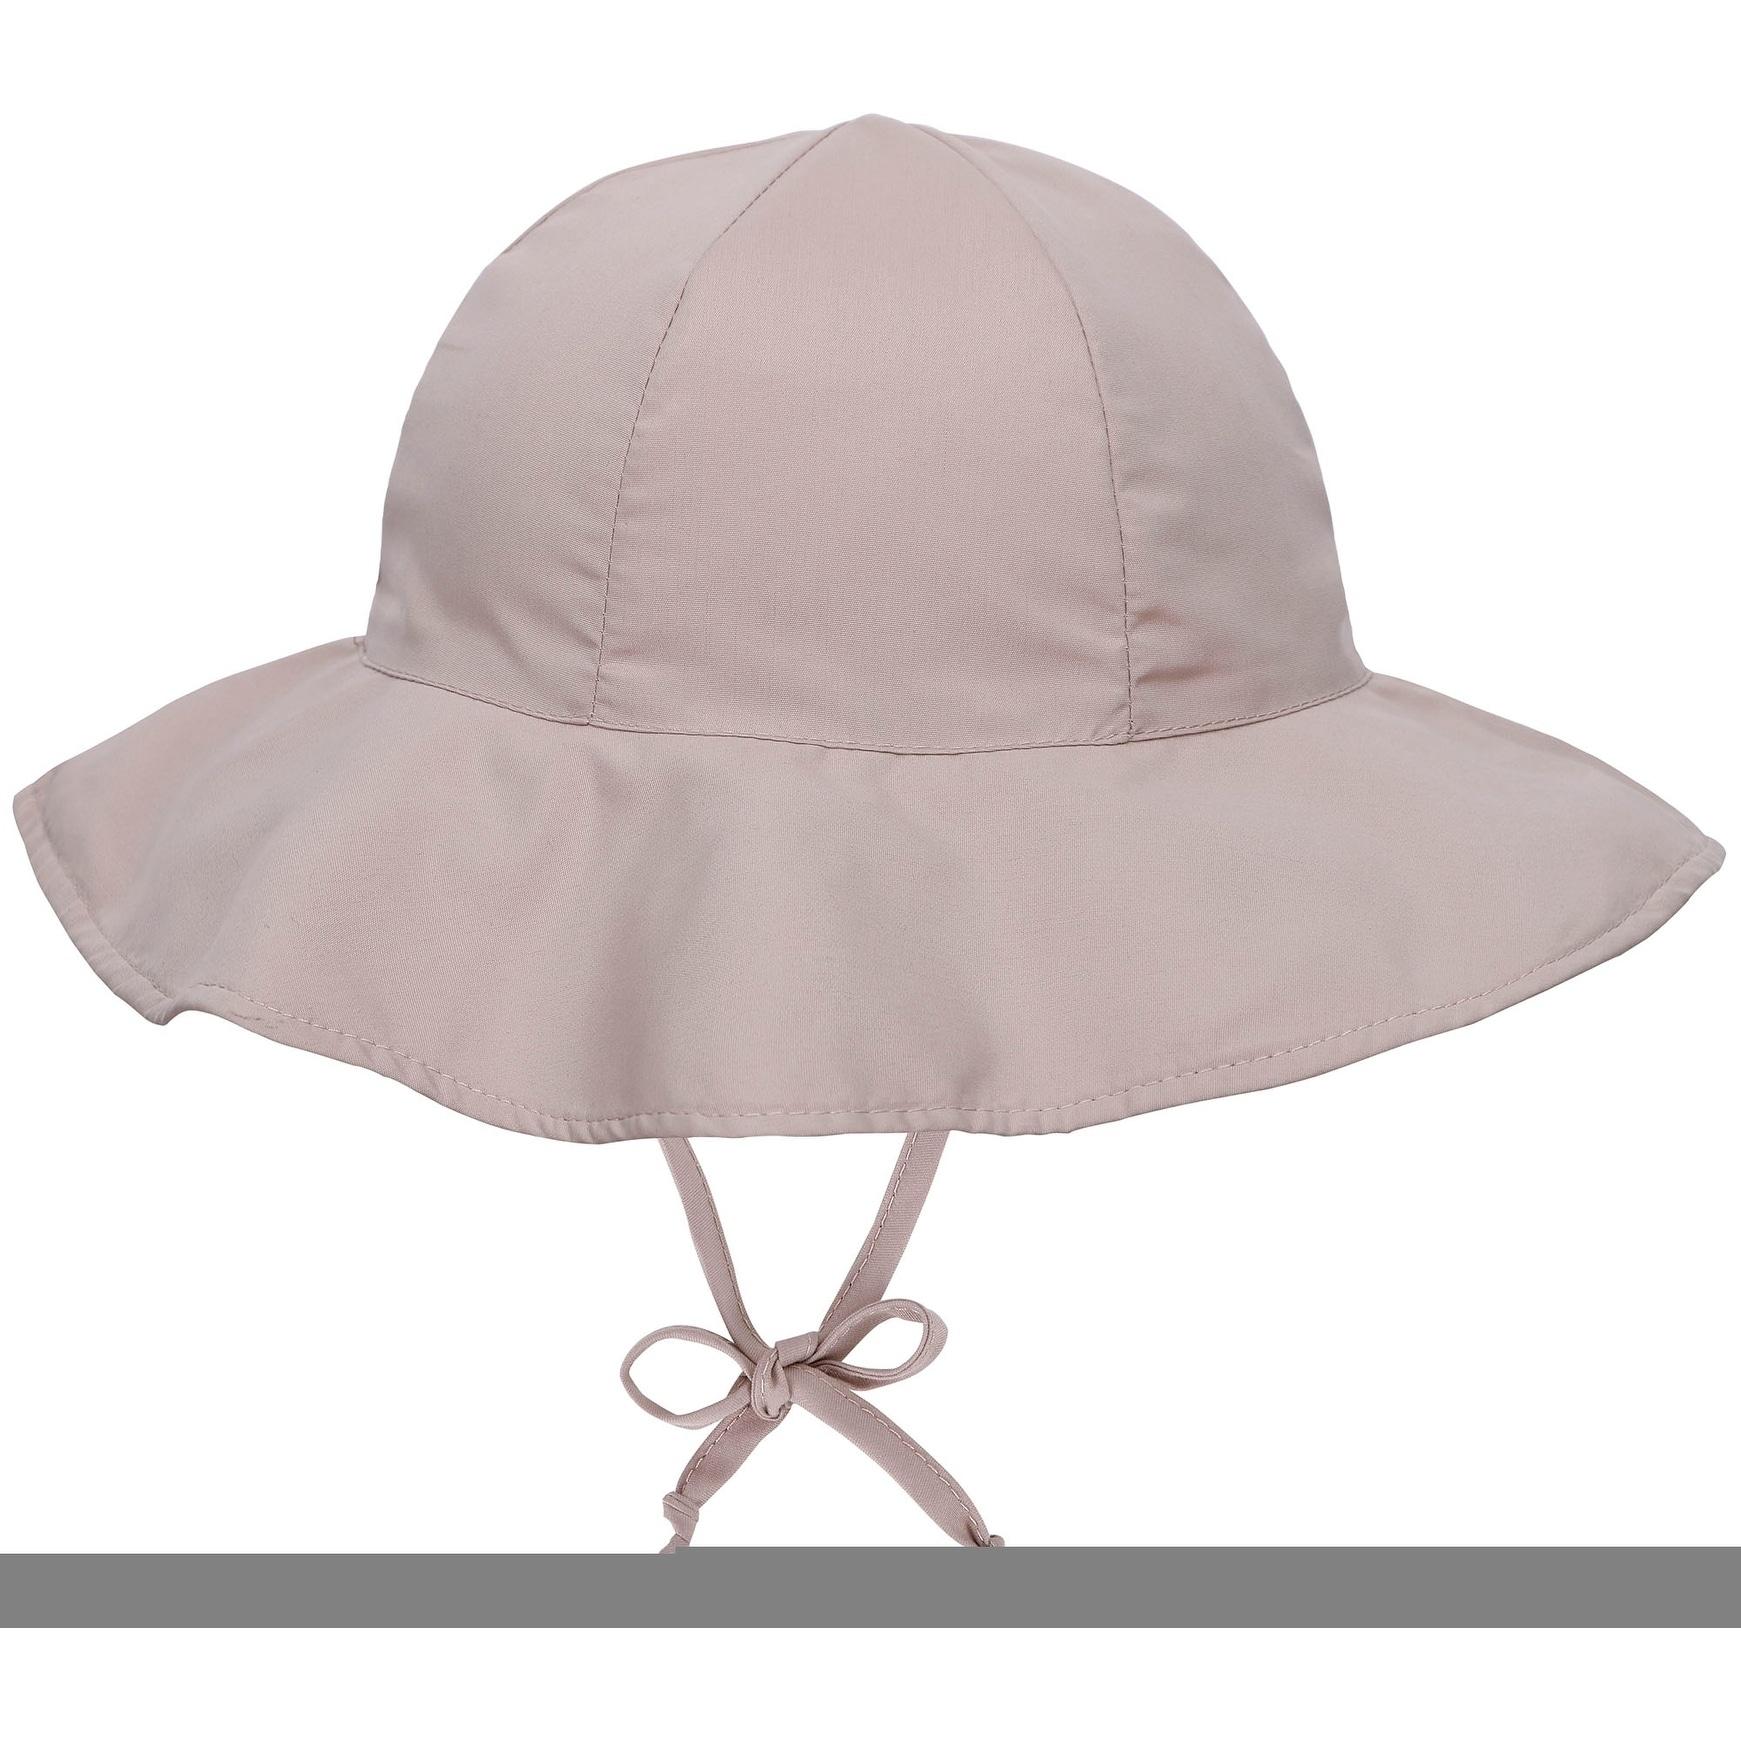 24cc5eb846a6 Simplikids UPF 50 UV Ray Sun Protection Wide Brim Baby Sun Hat White ...